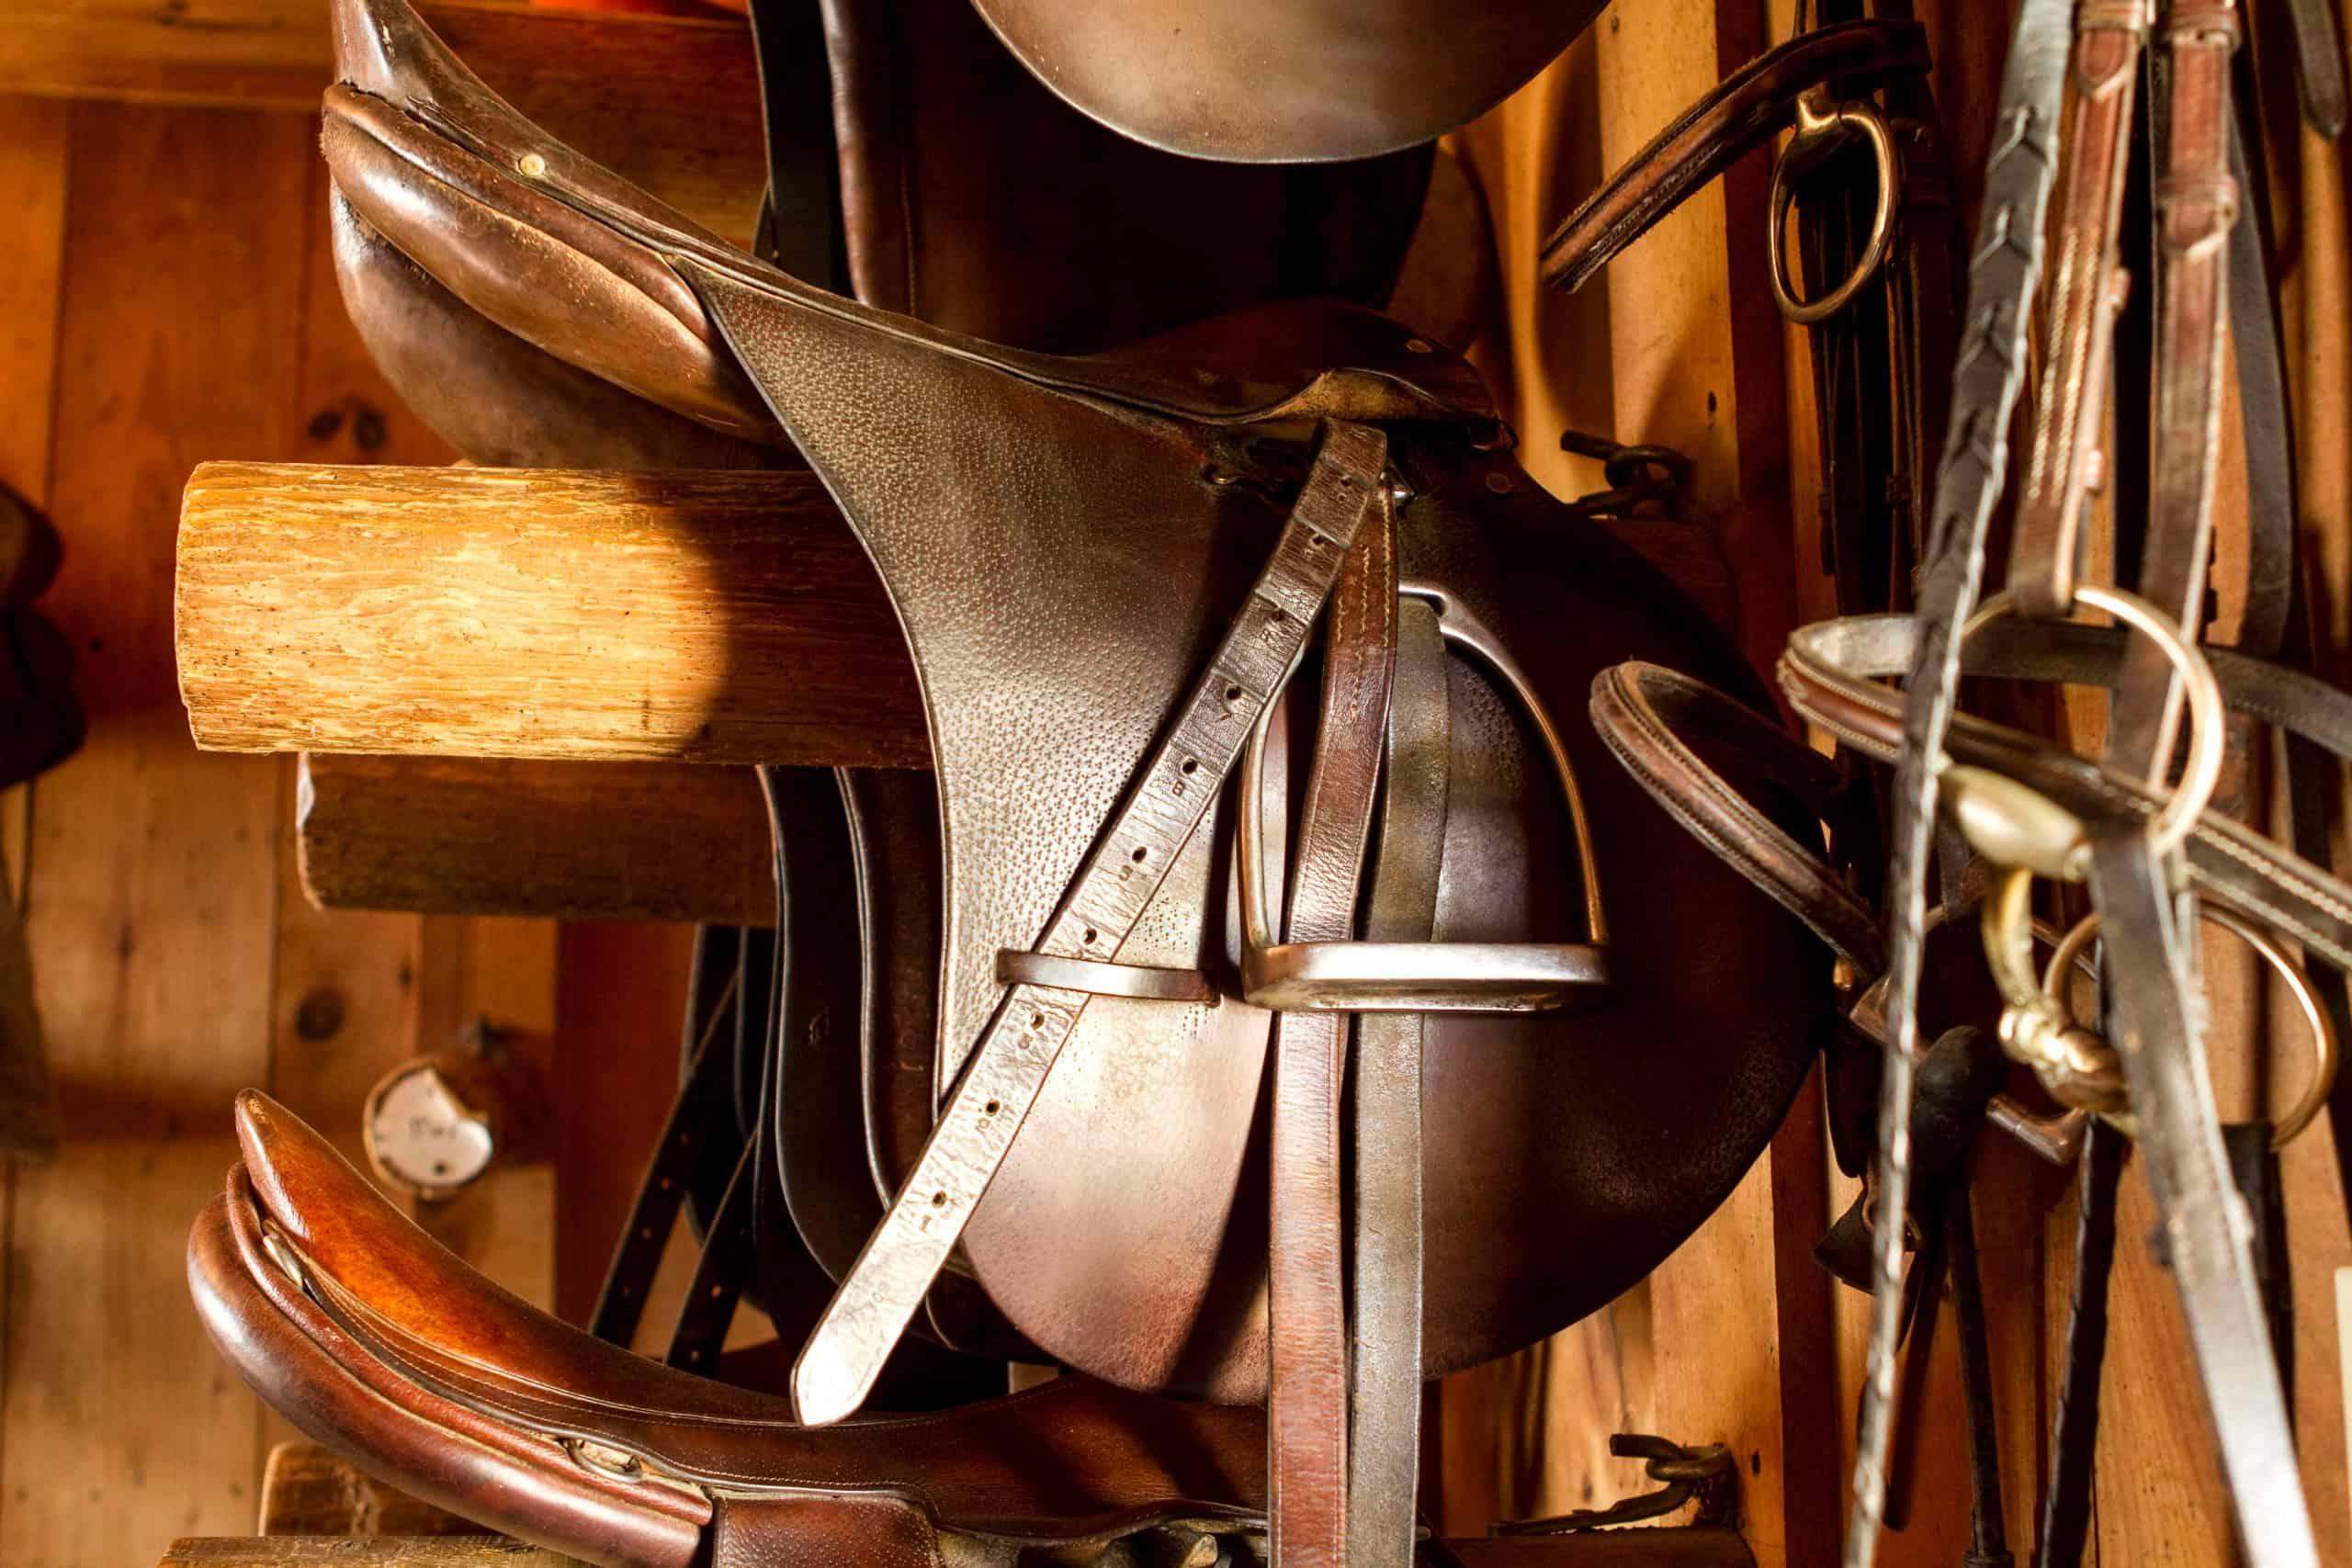 saddle care and maintenance storage